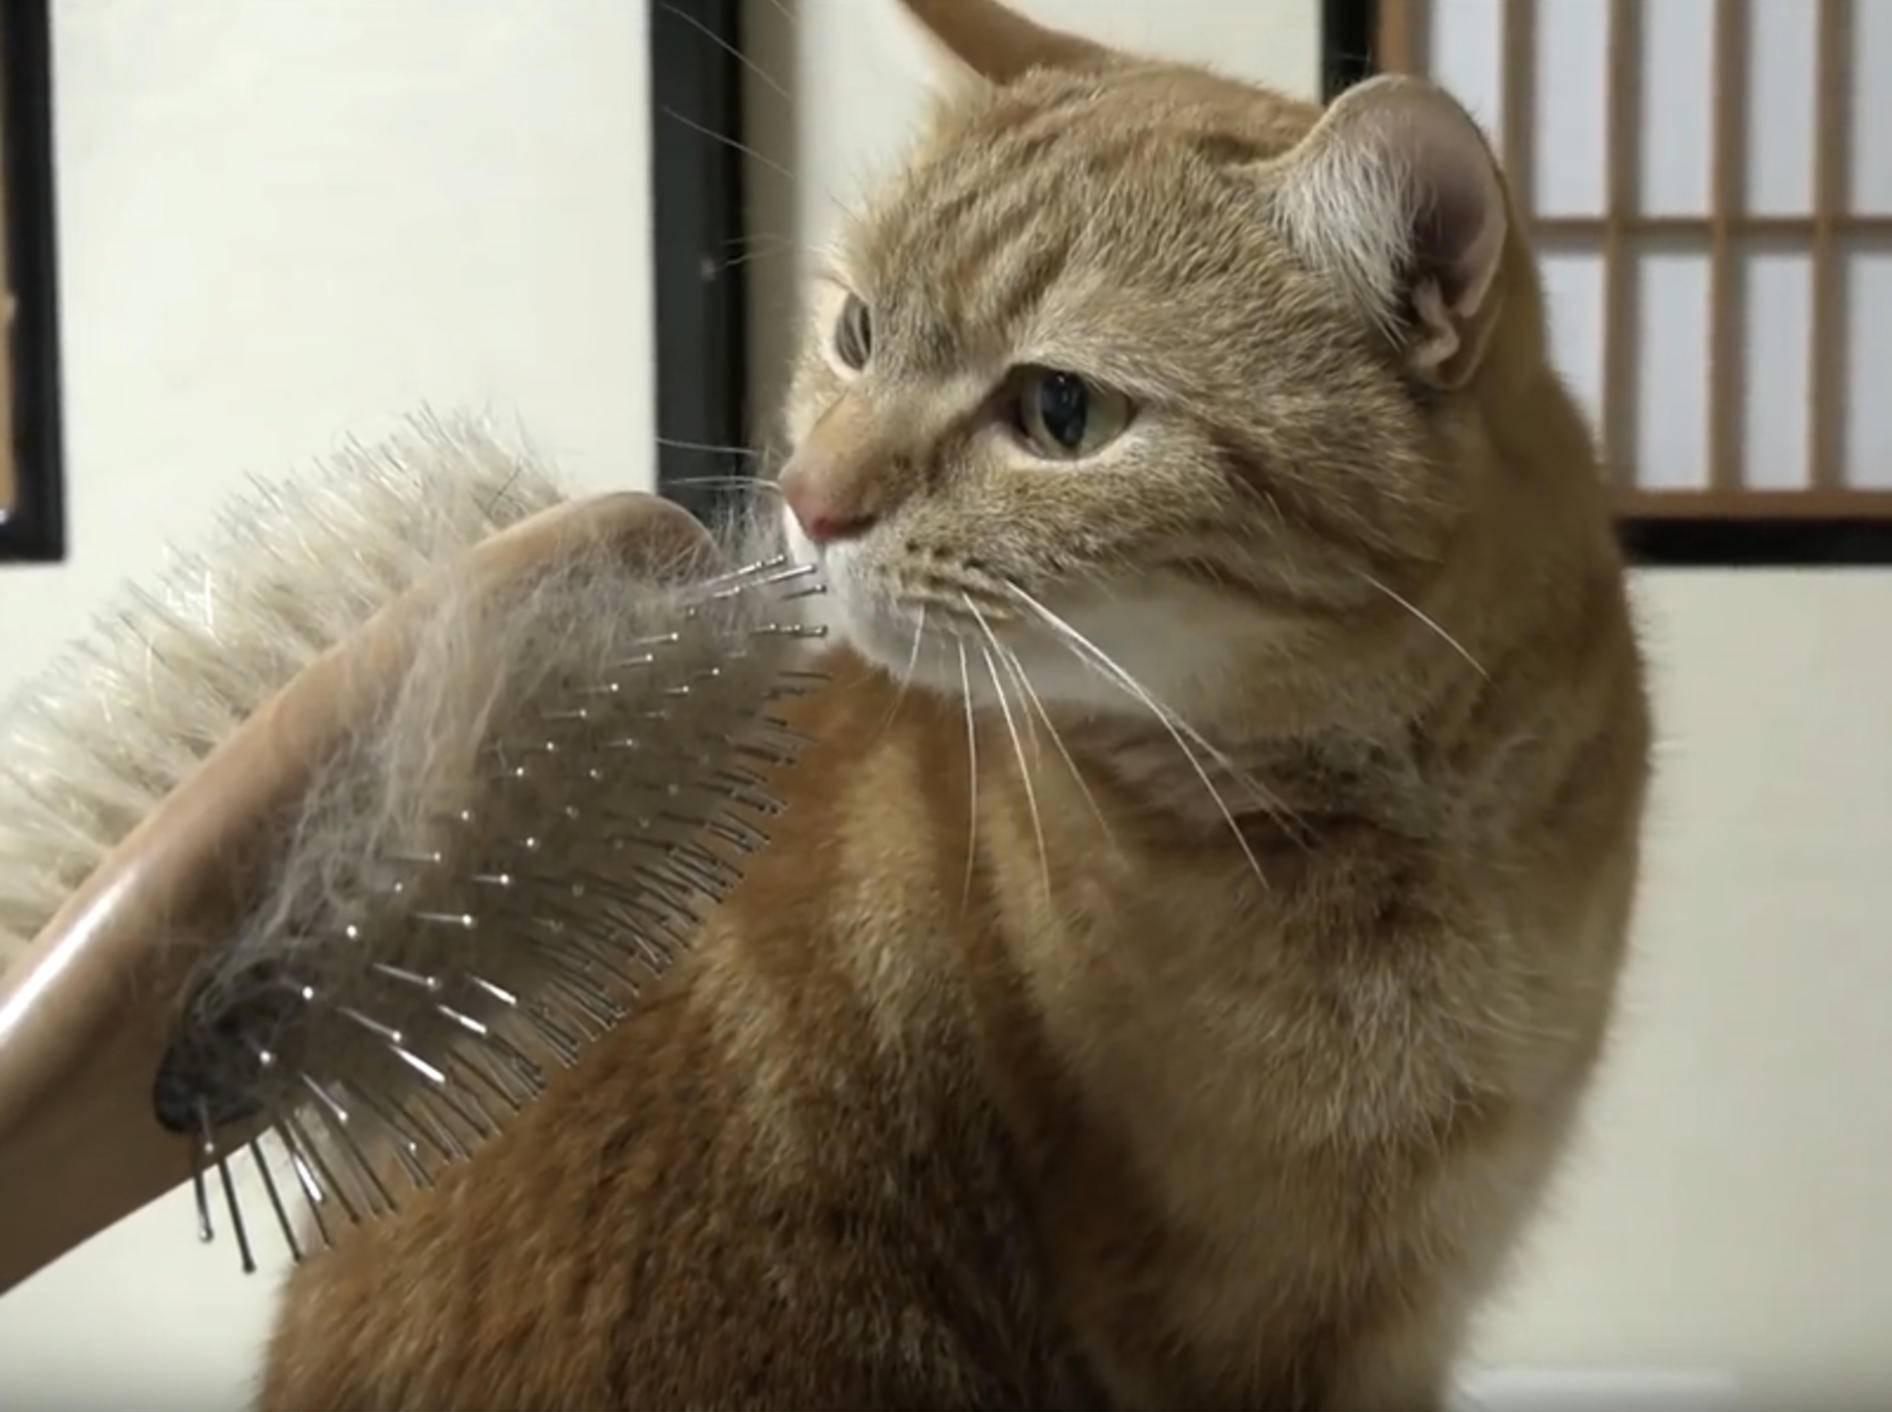 Katzenfreunde genießen die Fellpflege – YouTube / 10 Cats.